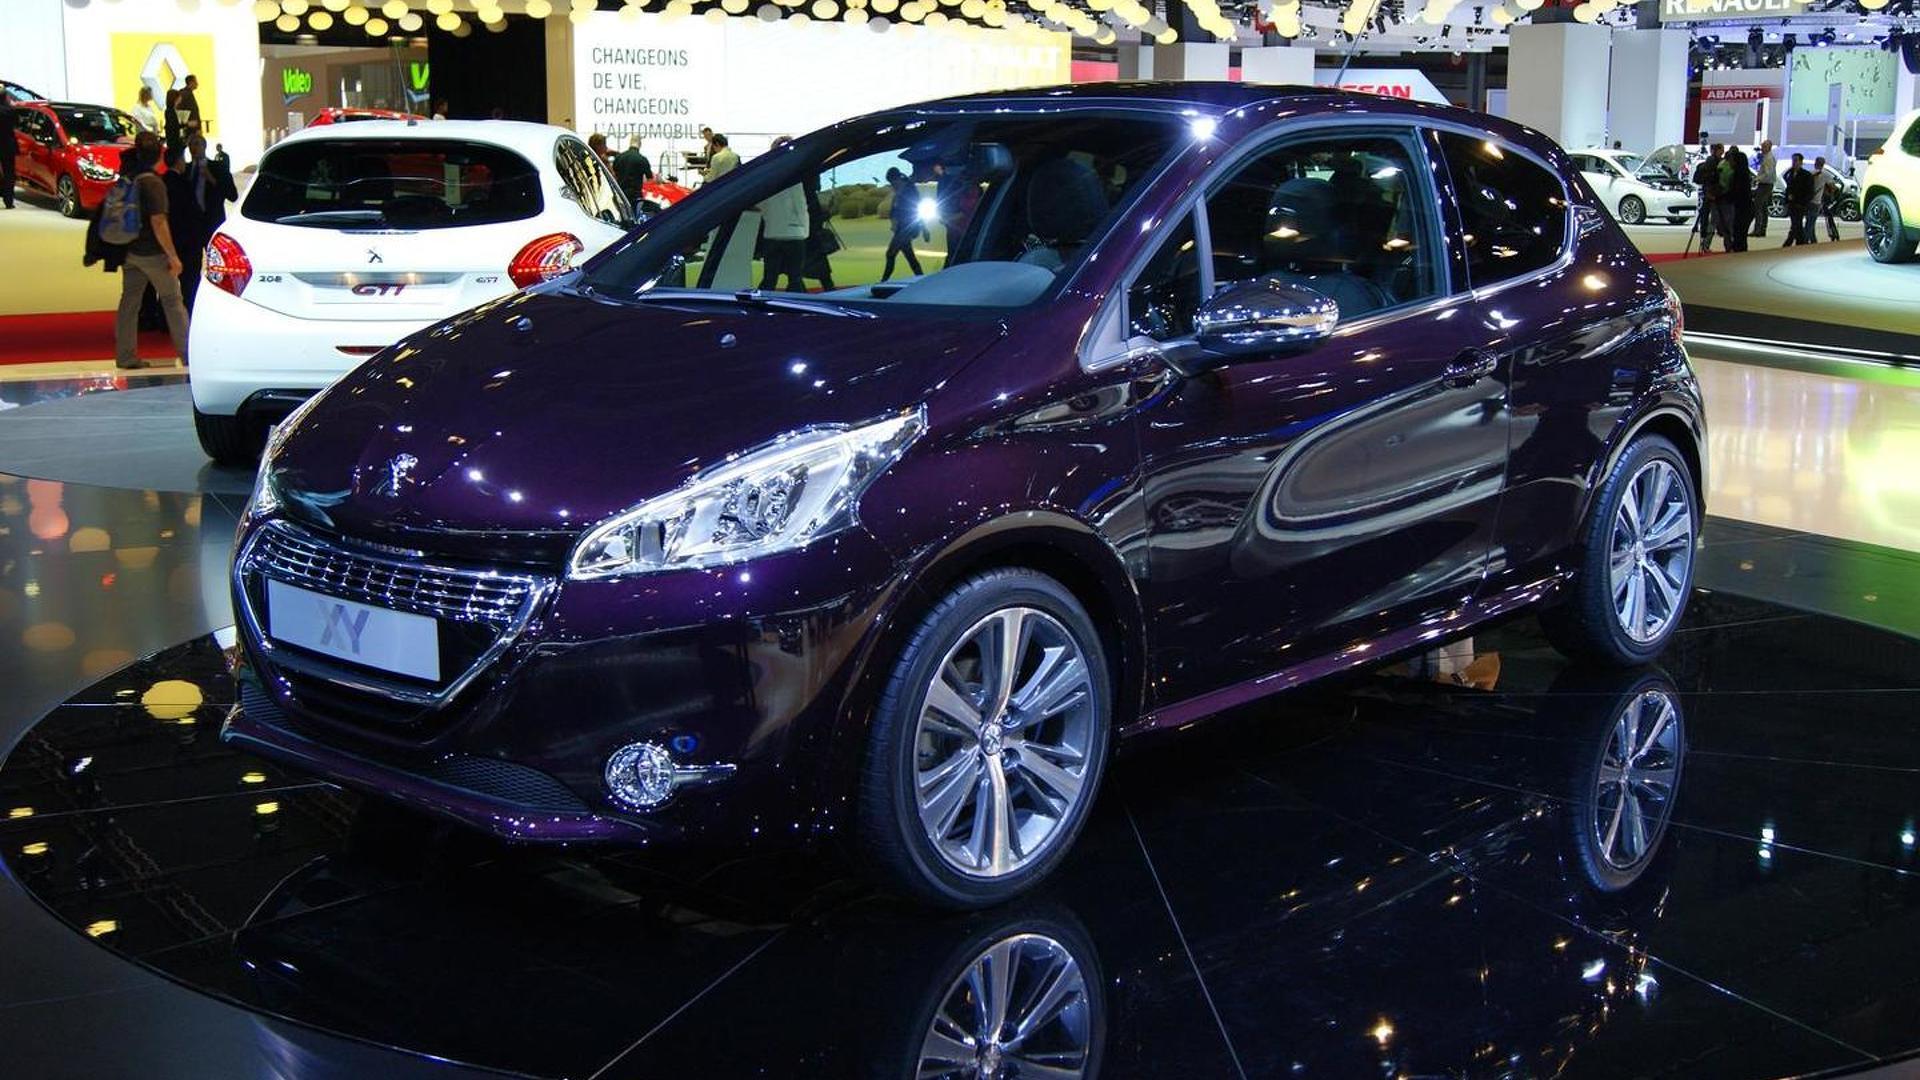 2019 - [Renault]  Captur II [HJB]  - Page 28 2012-336579-peugeot-208-xy-at-2012-paris-motor-show1